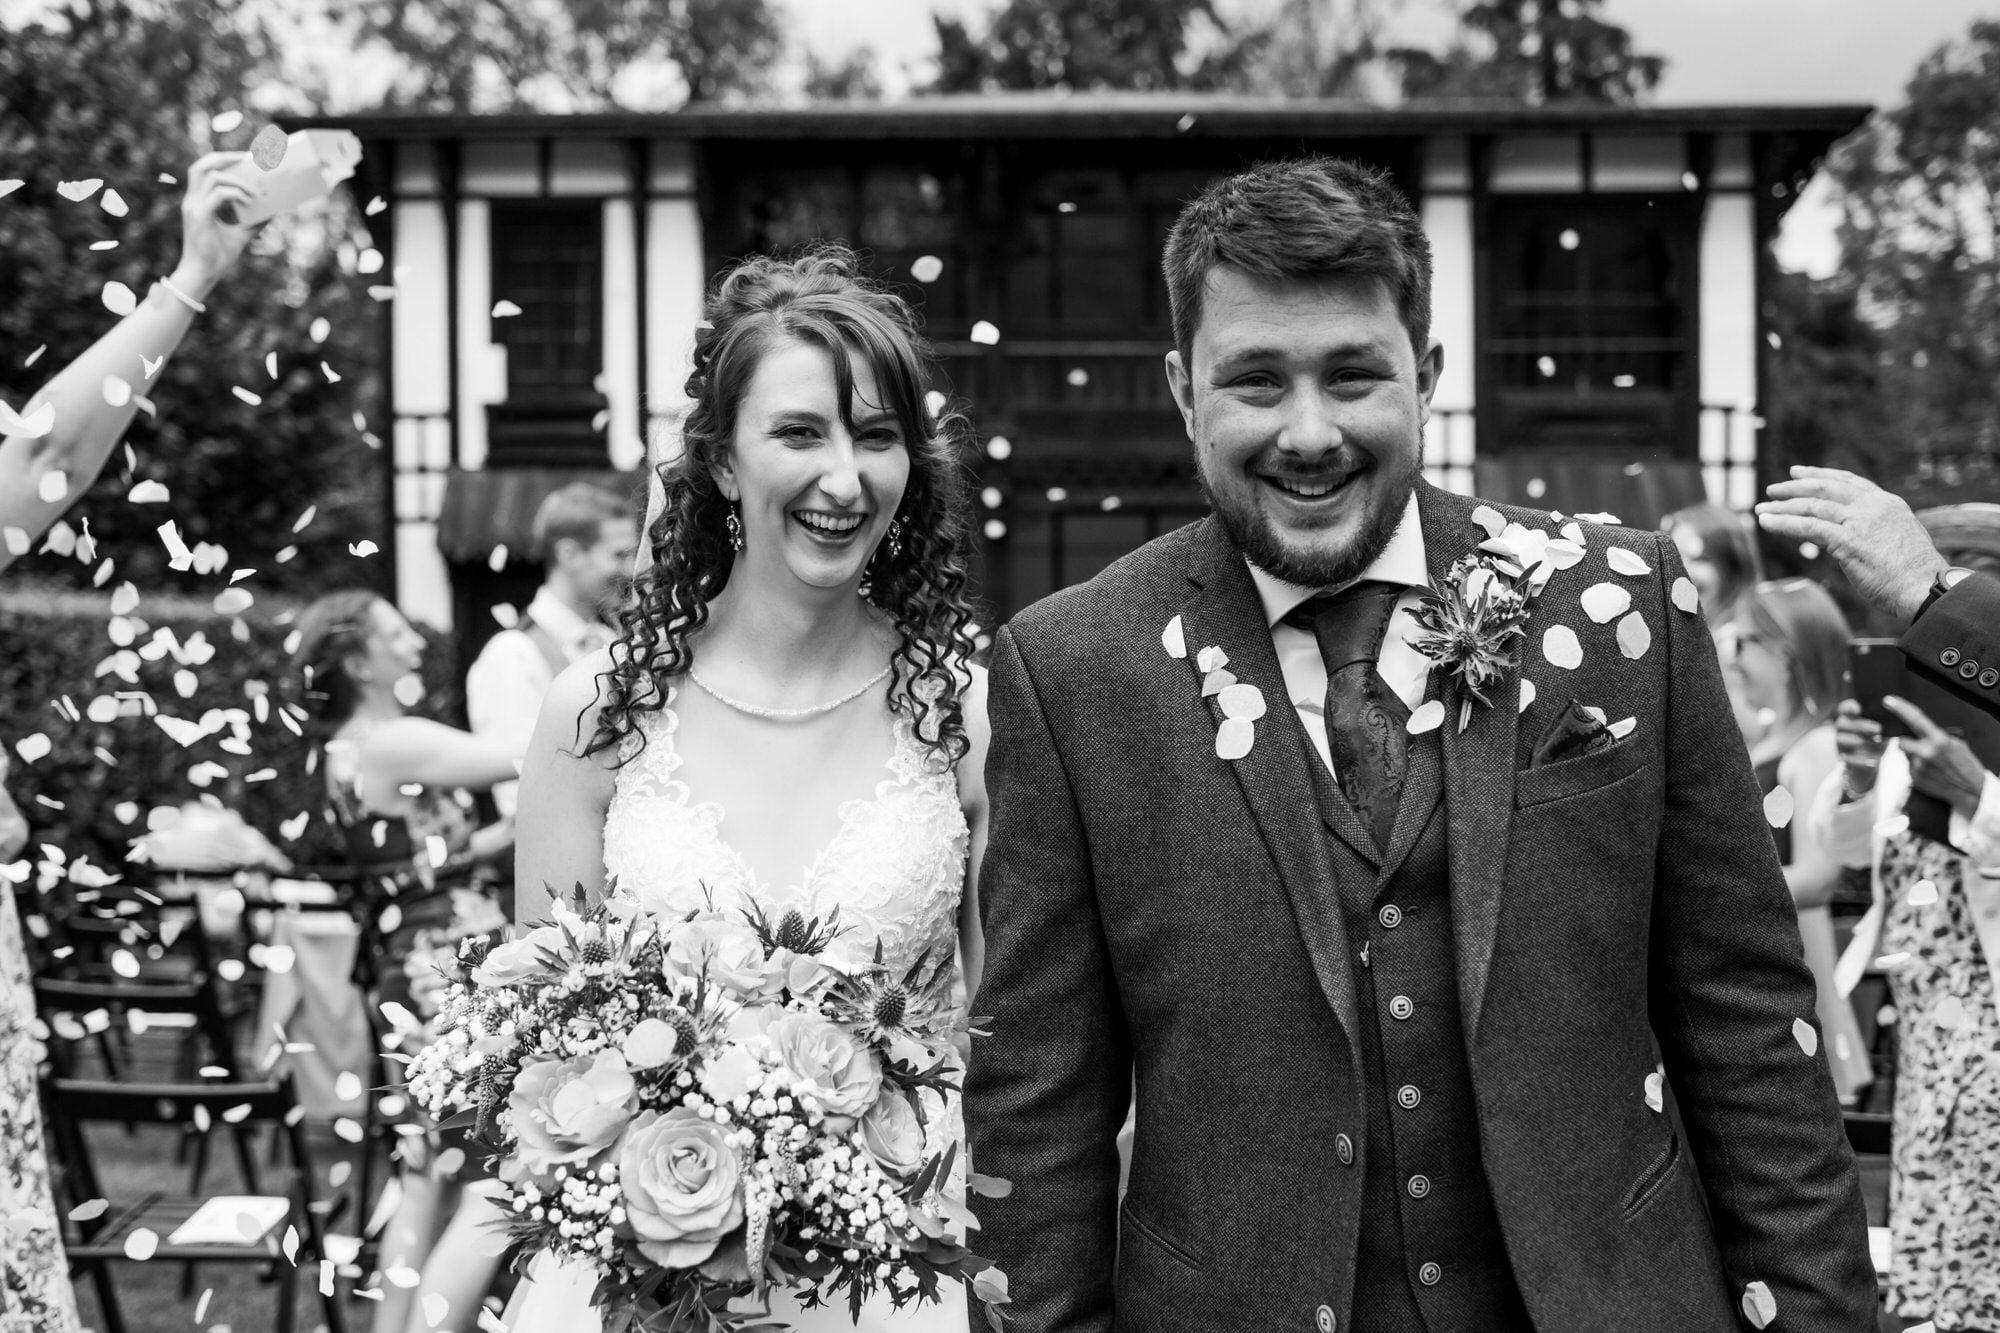 Larmer Tree Wedding confetti